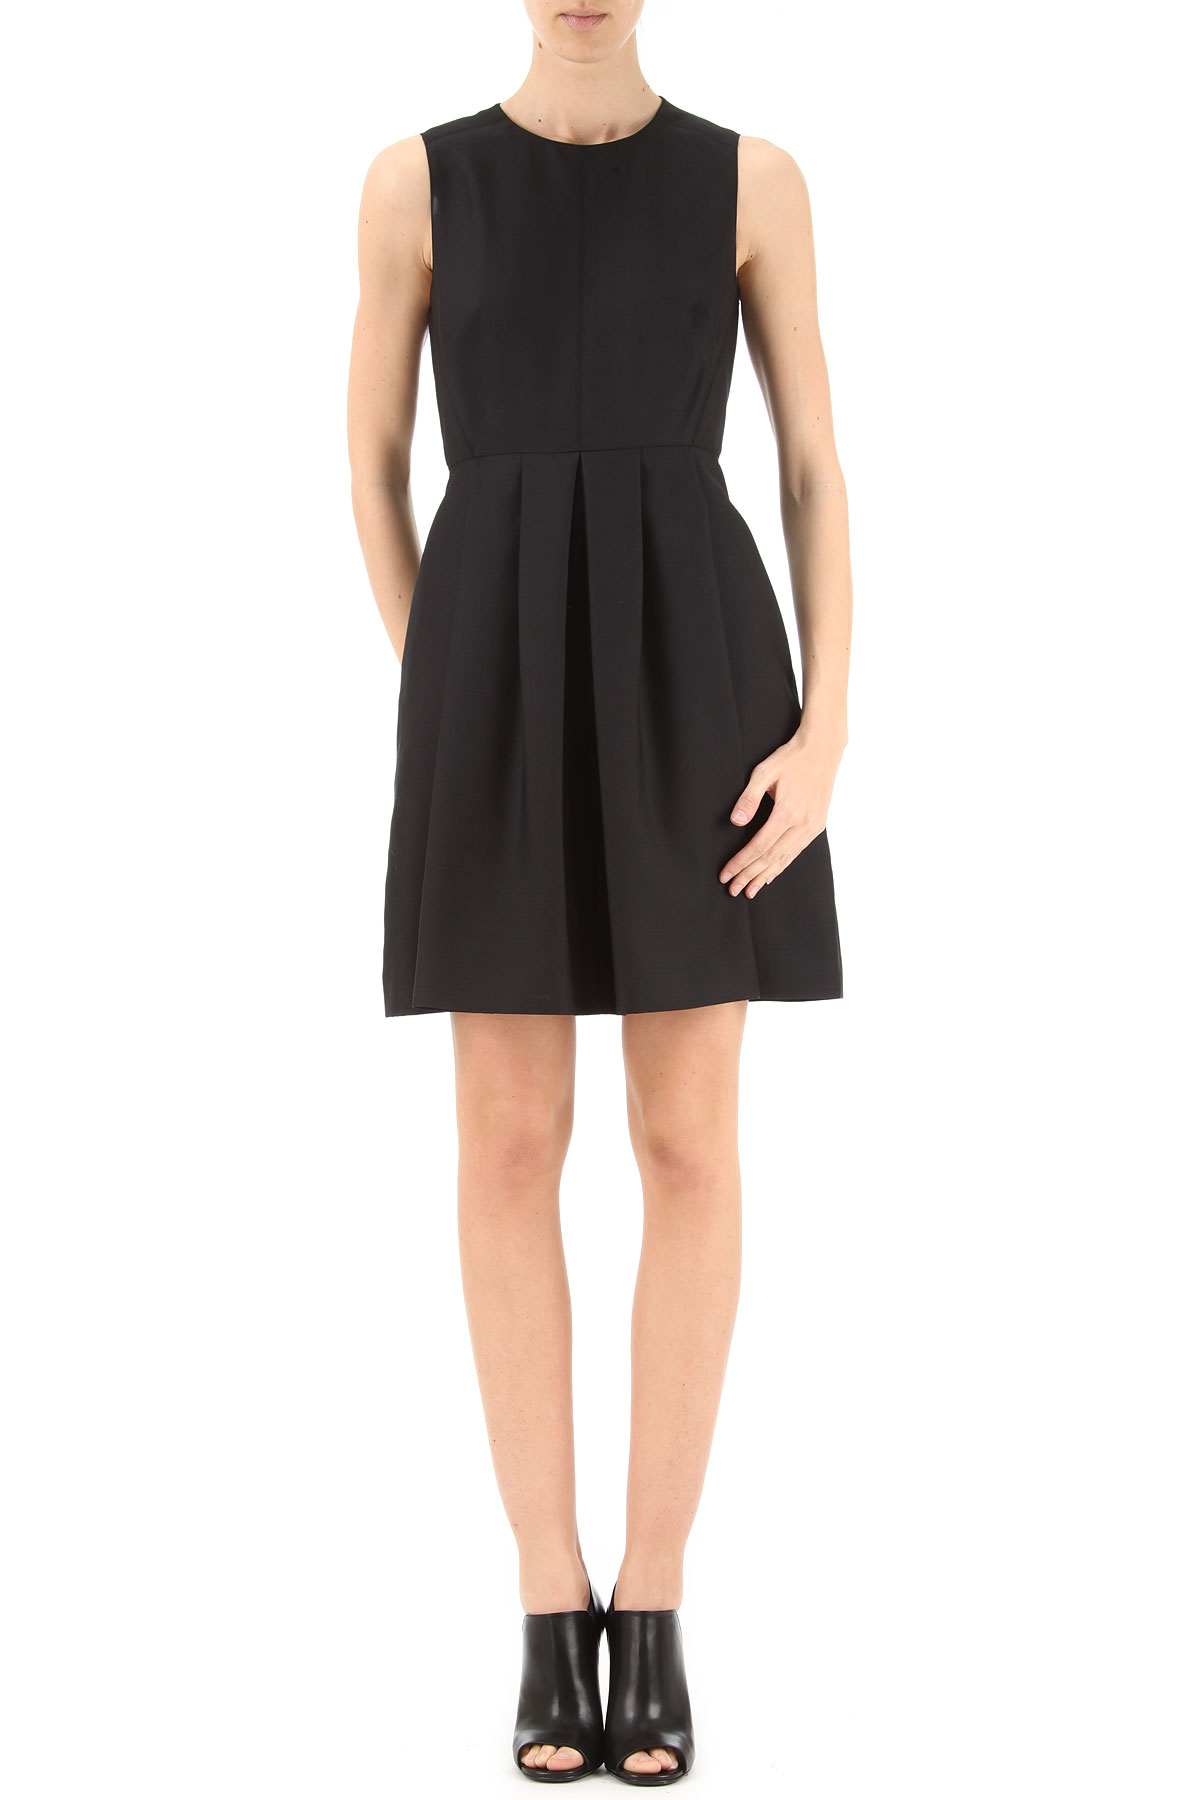 6c61c07c74 Burberry Φόρεμα για Γυναίκες